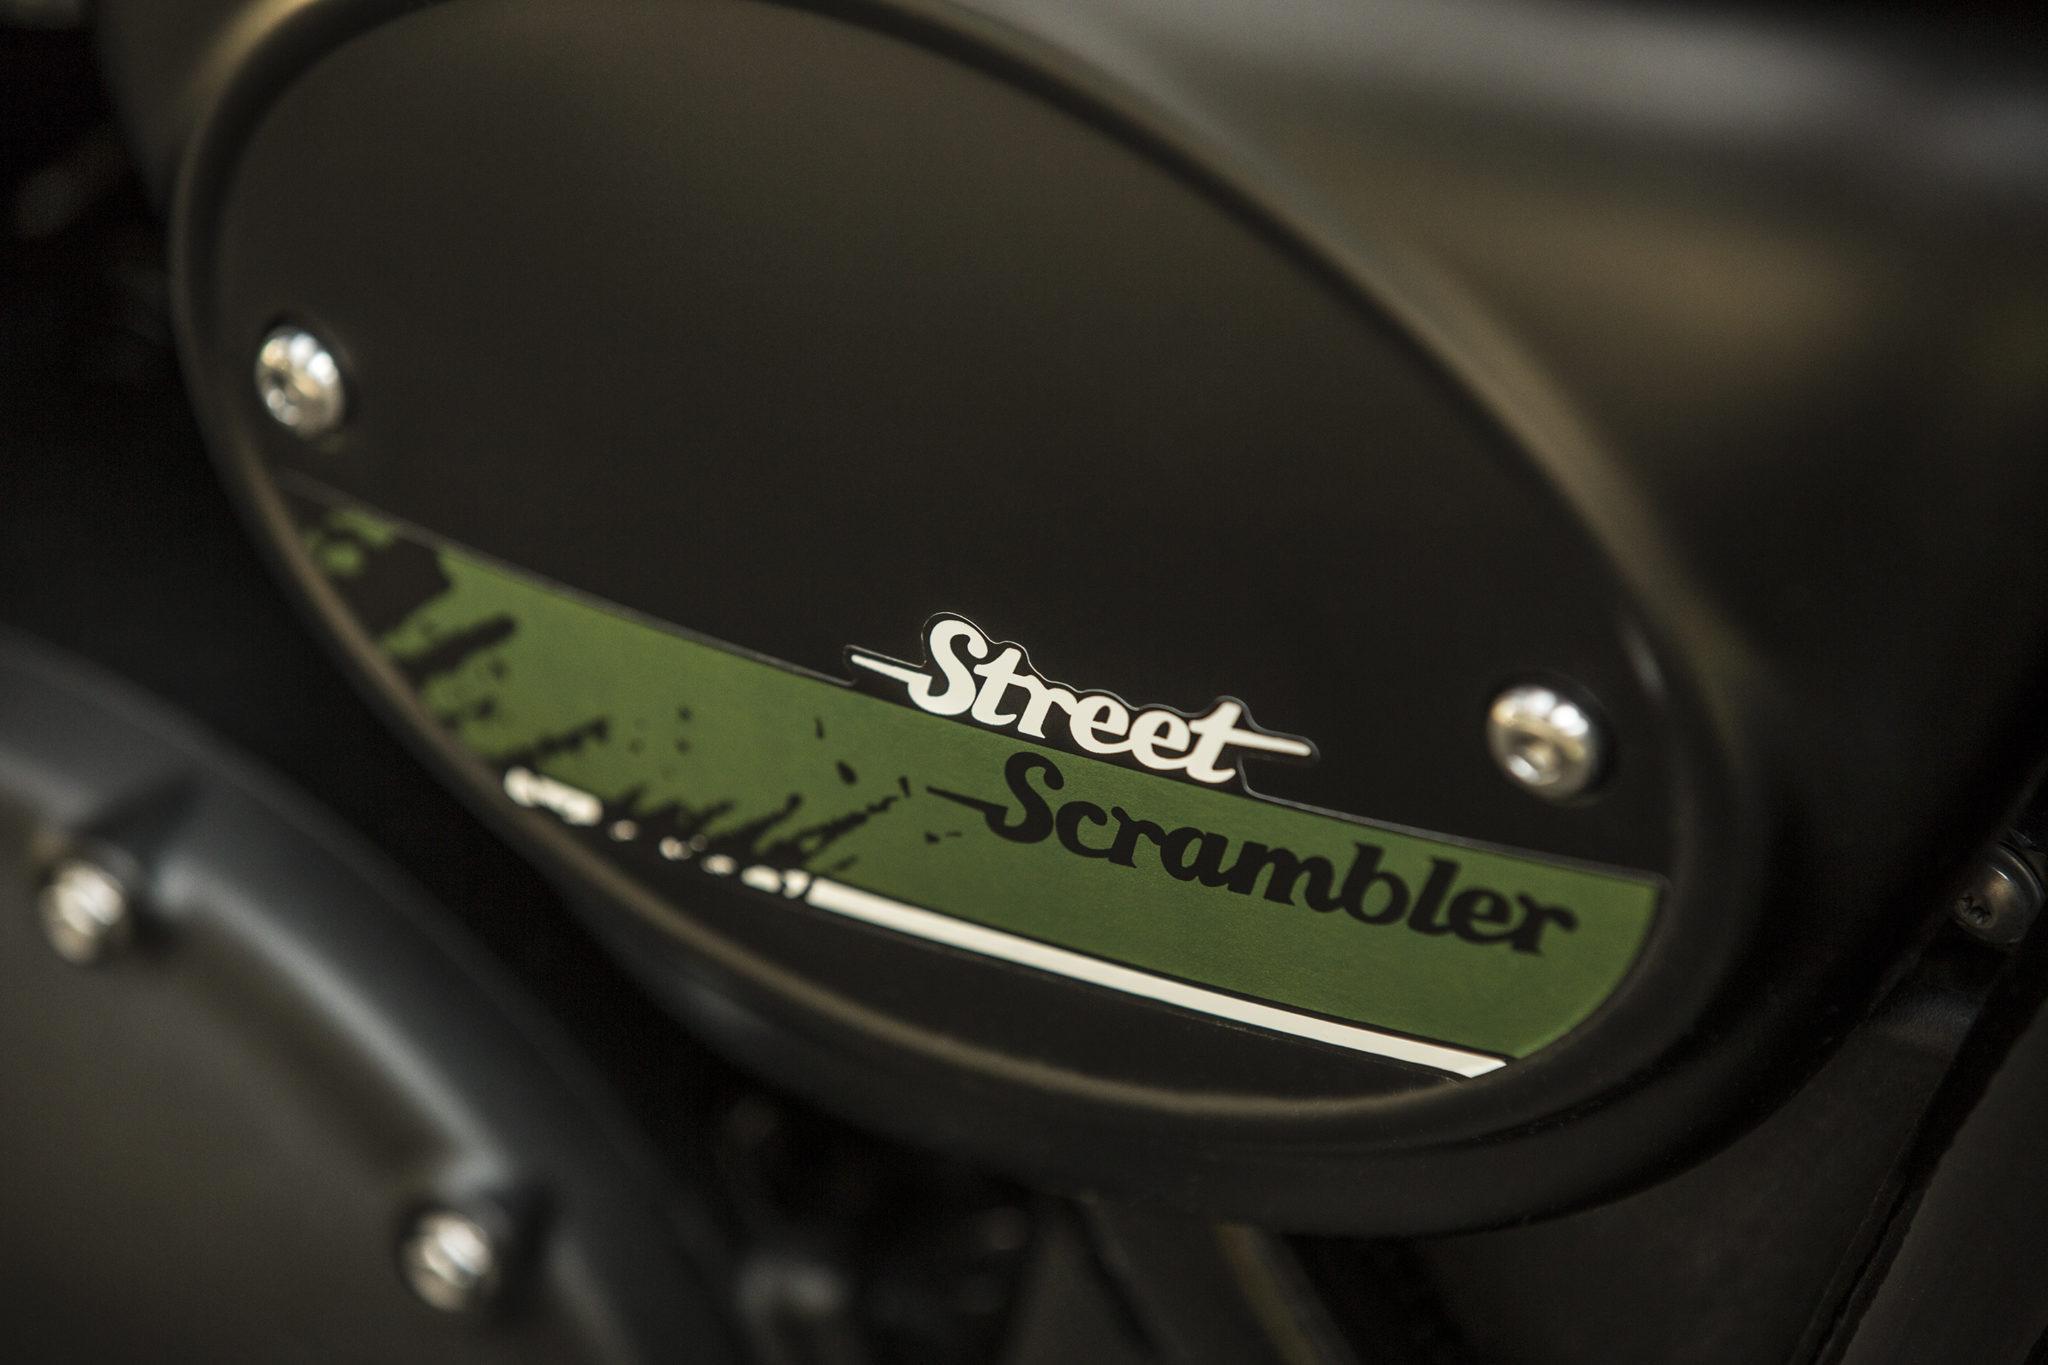 Triumph Street Scrambler 2019